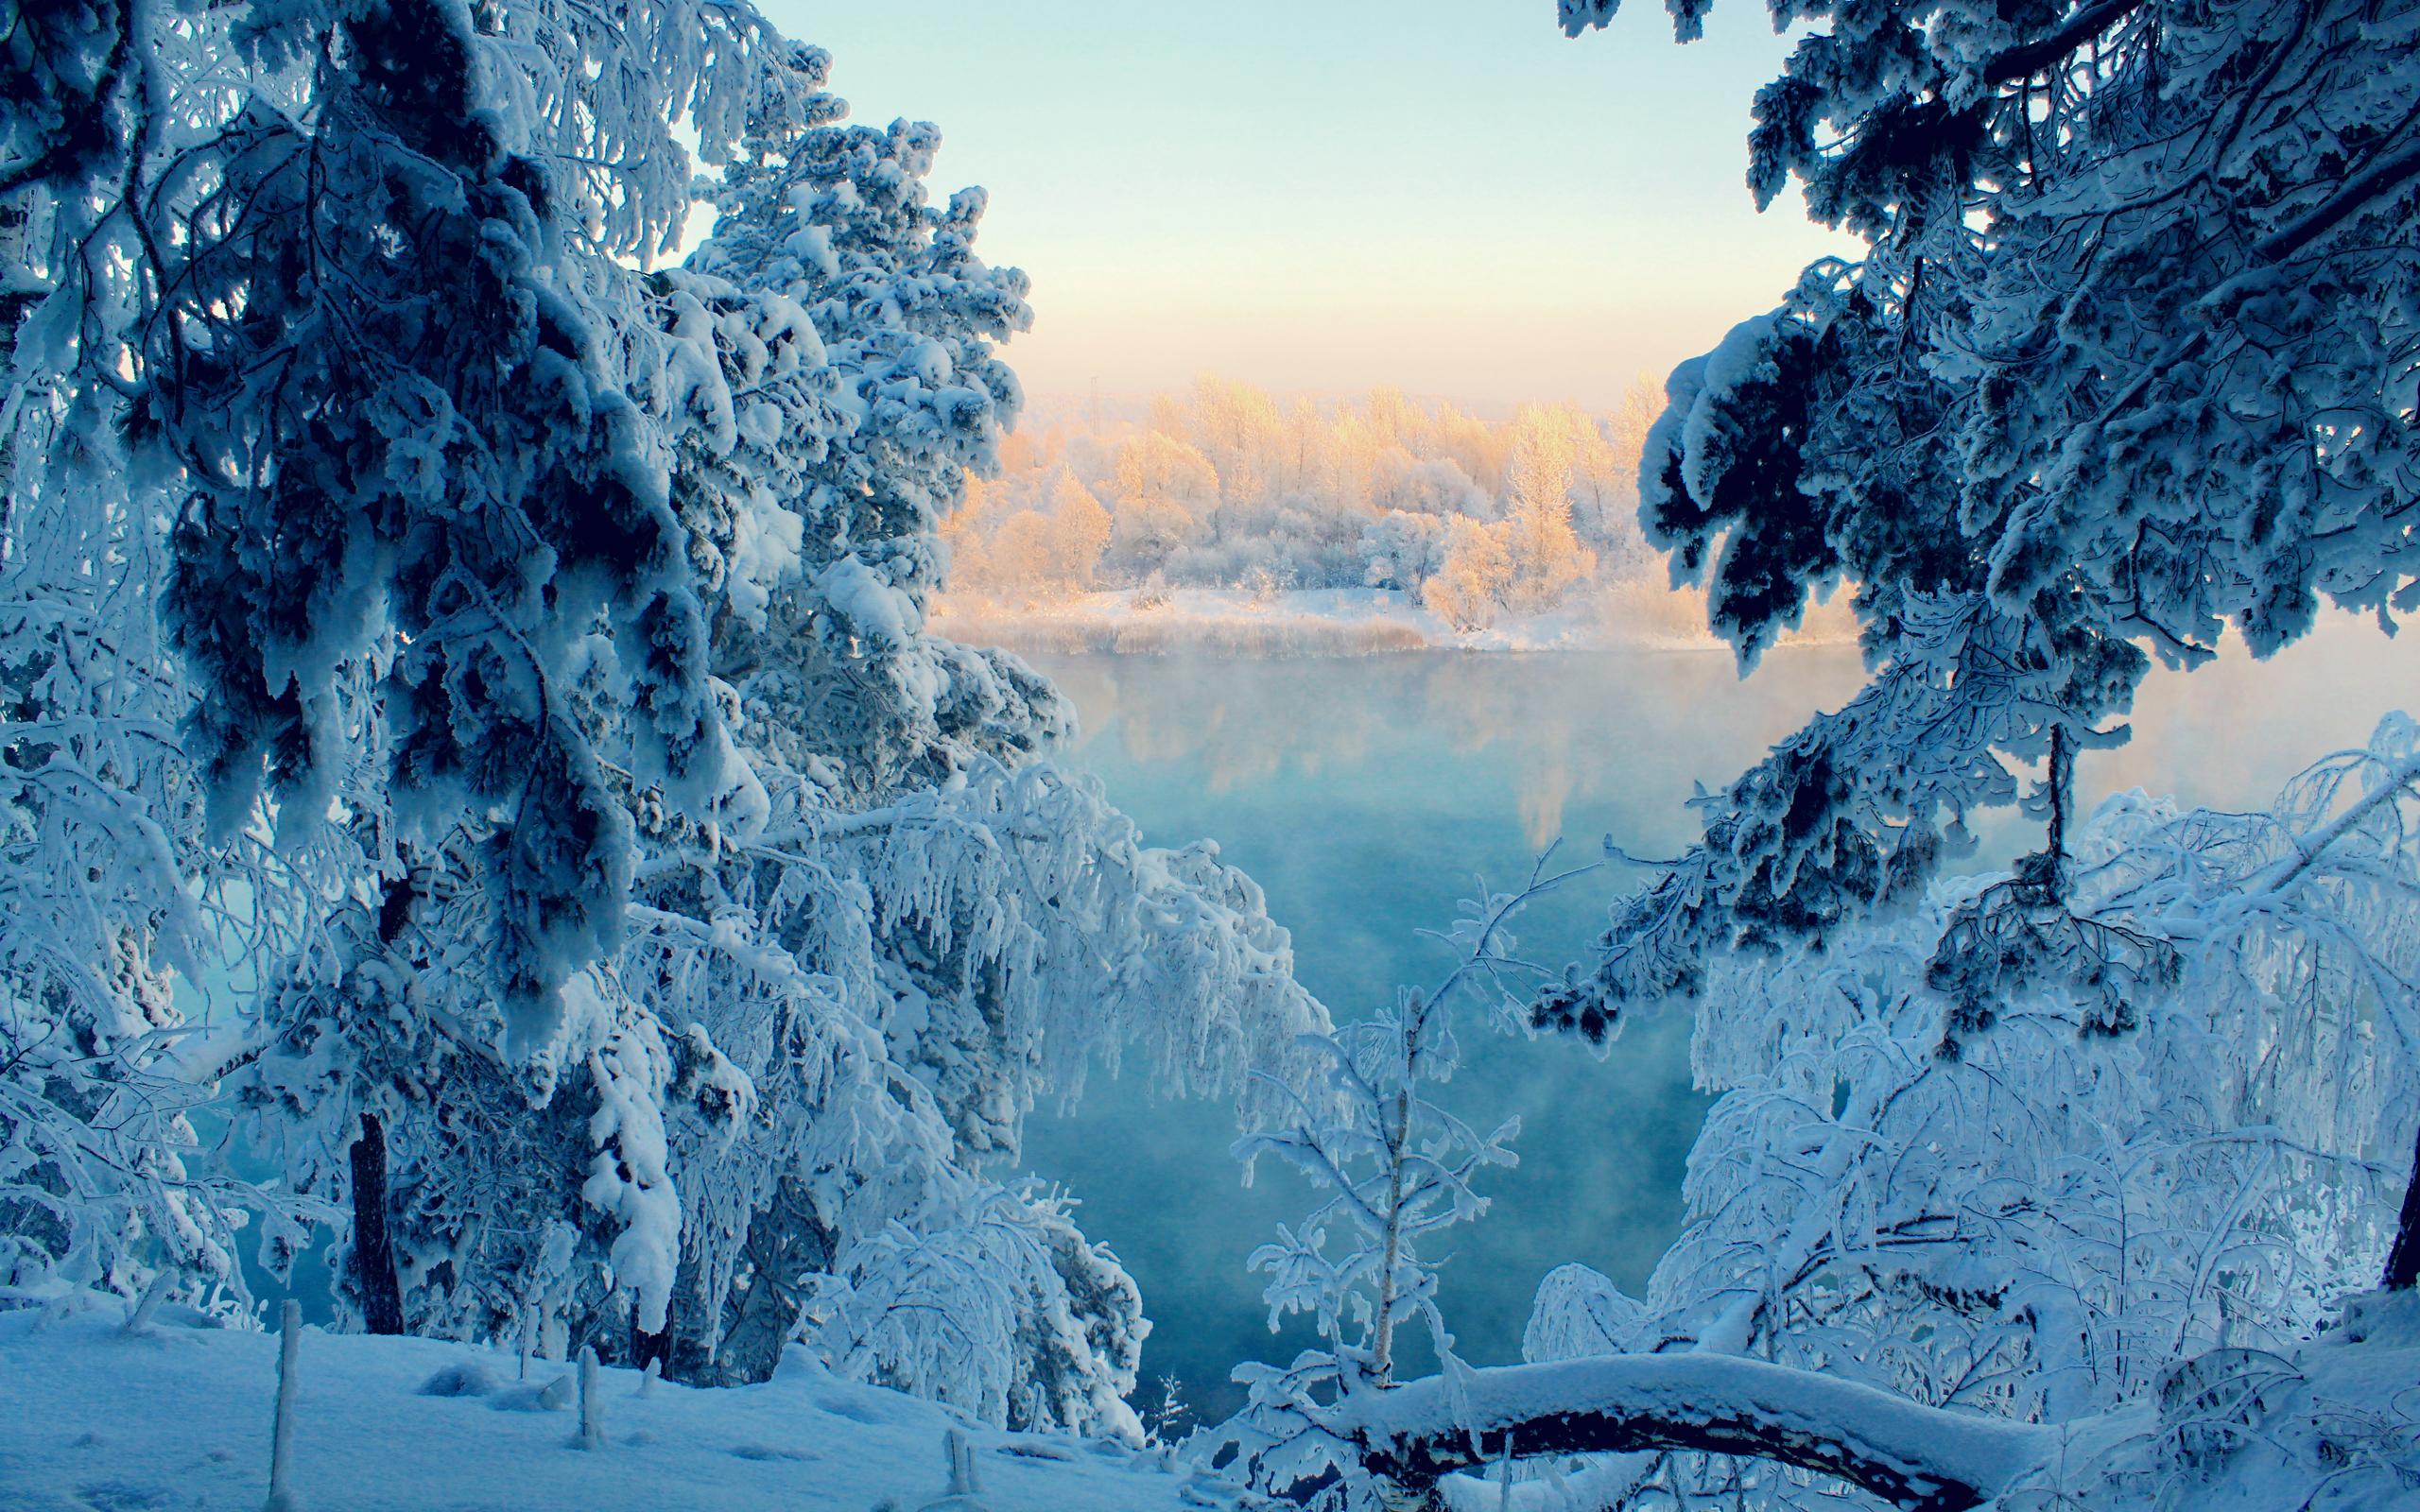 Обои зима деревья лес снег озеро для